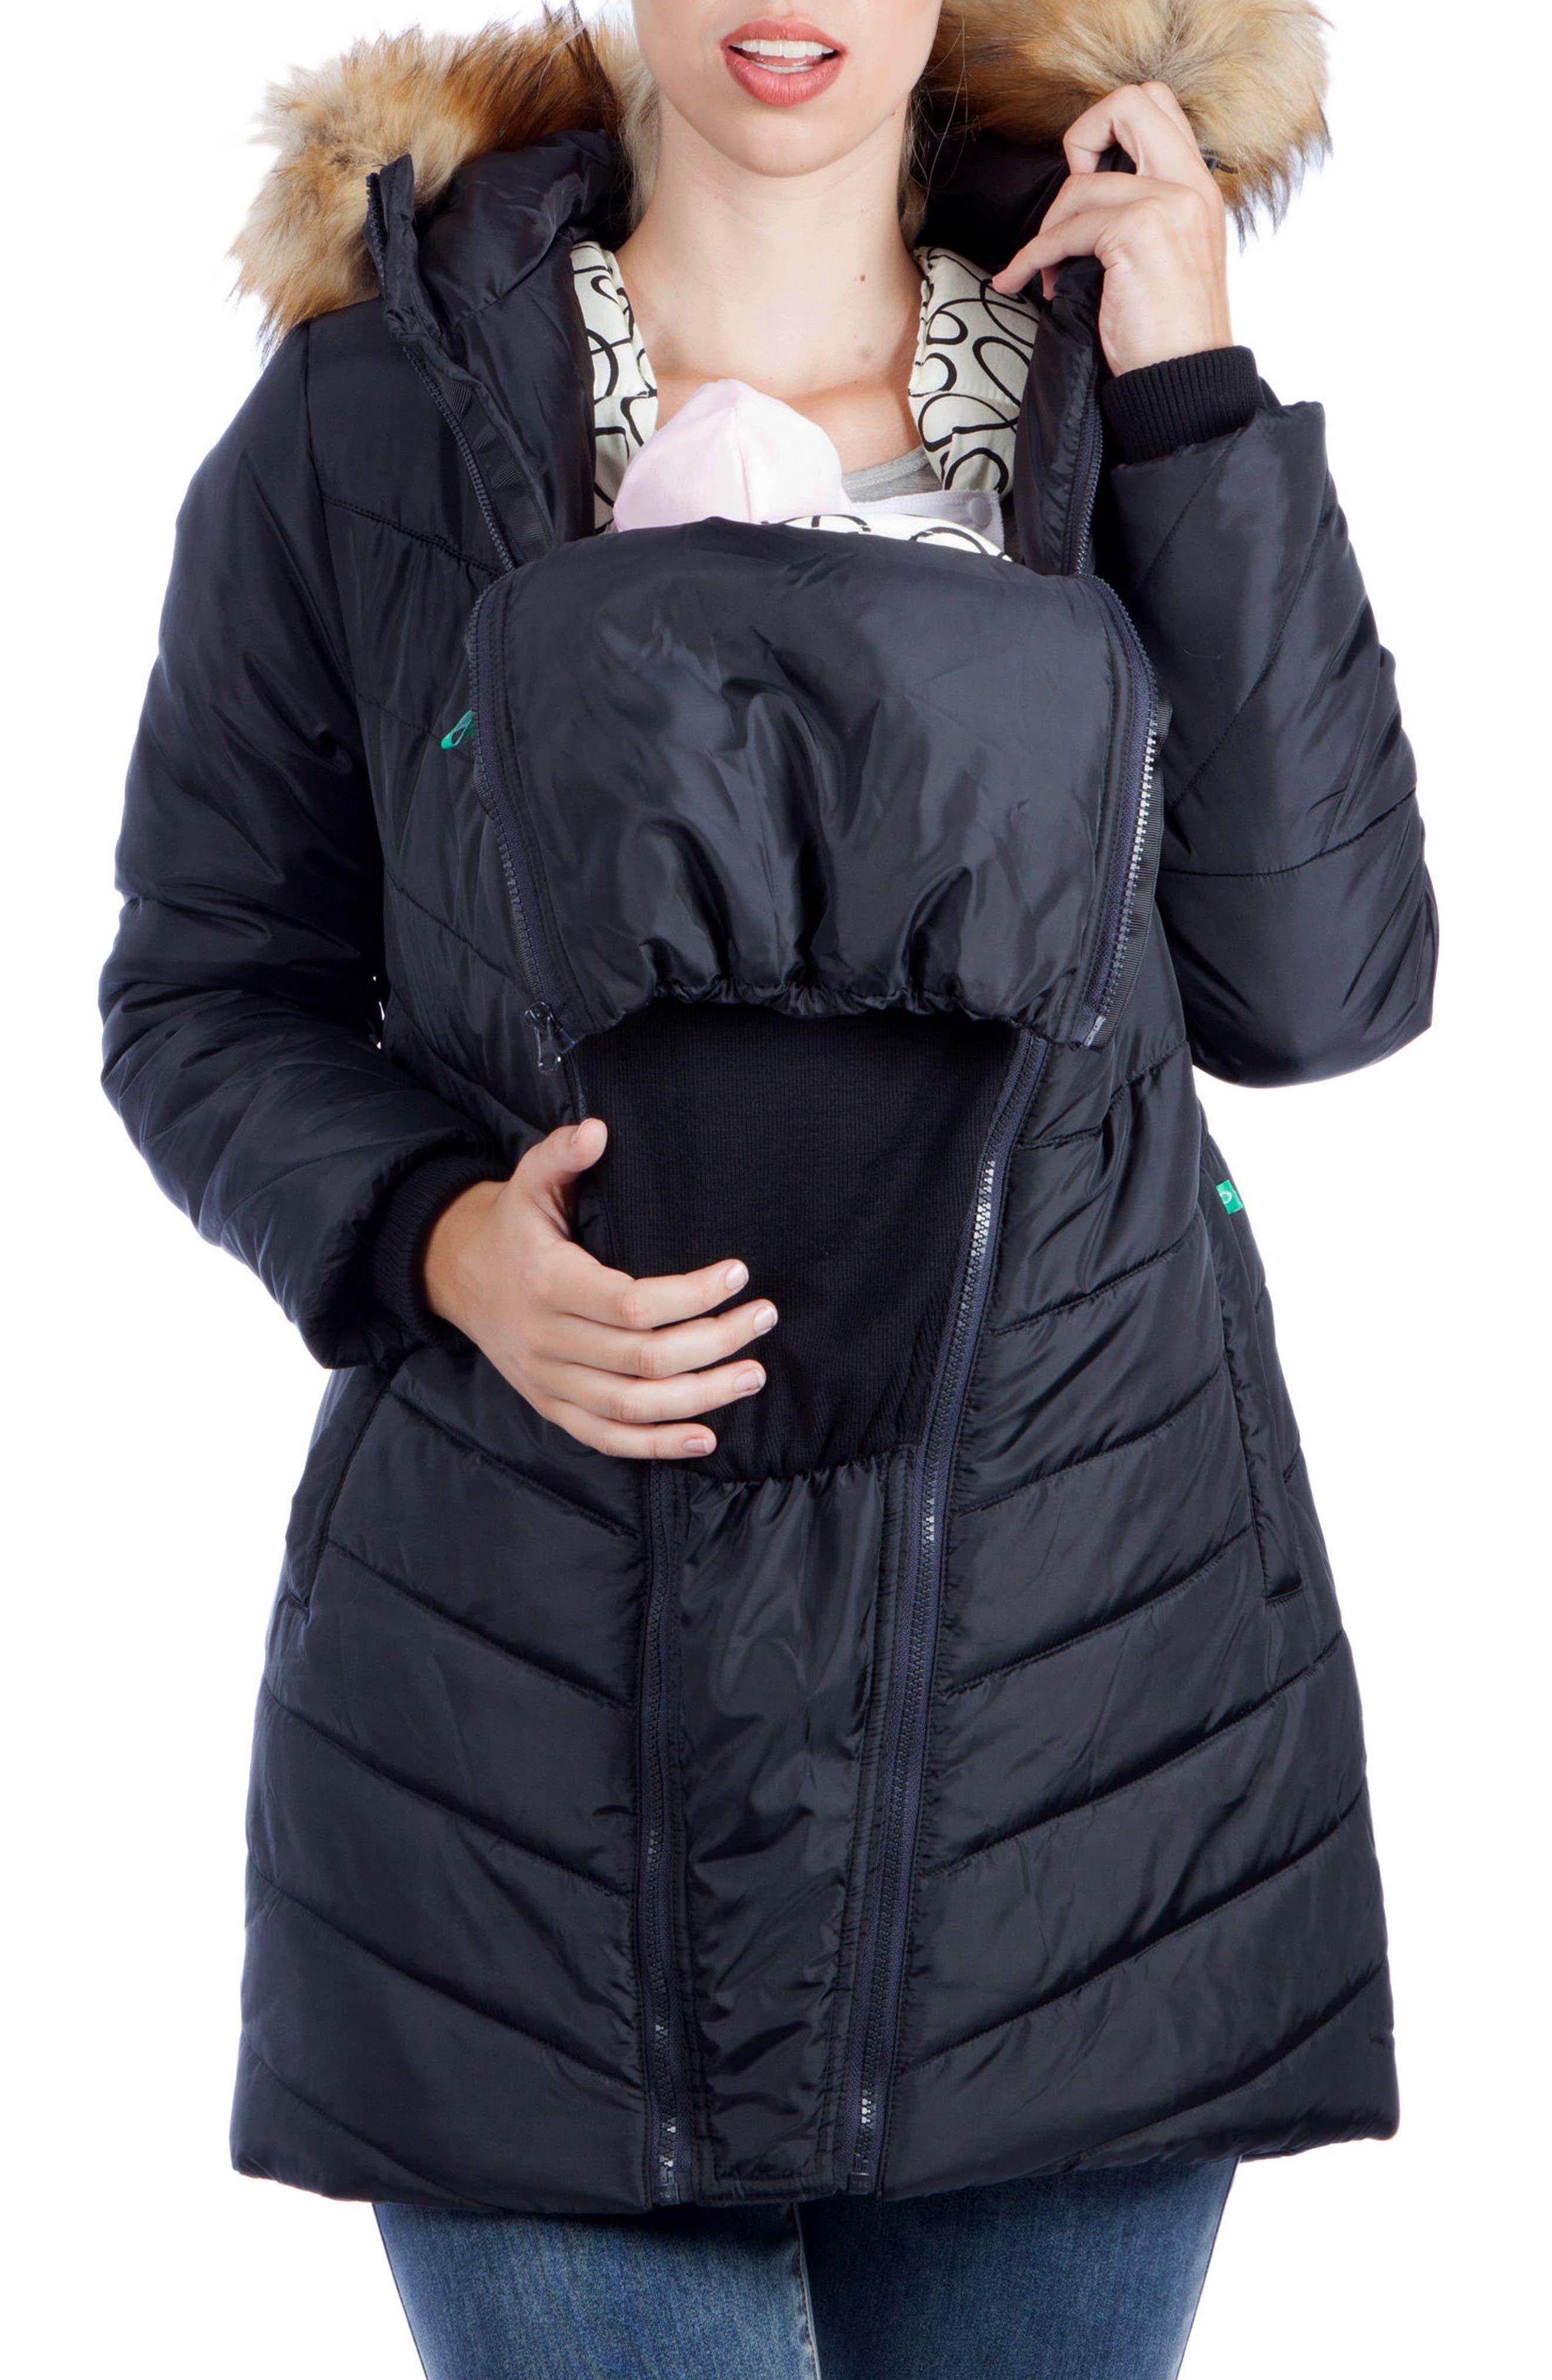 MODERN ETERNITY, Faux Fur Trim Convertible Puffer 3-in-1 Maternity Jacket, Alternate thumbnail 5, color, BLACK